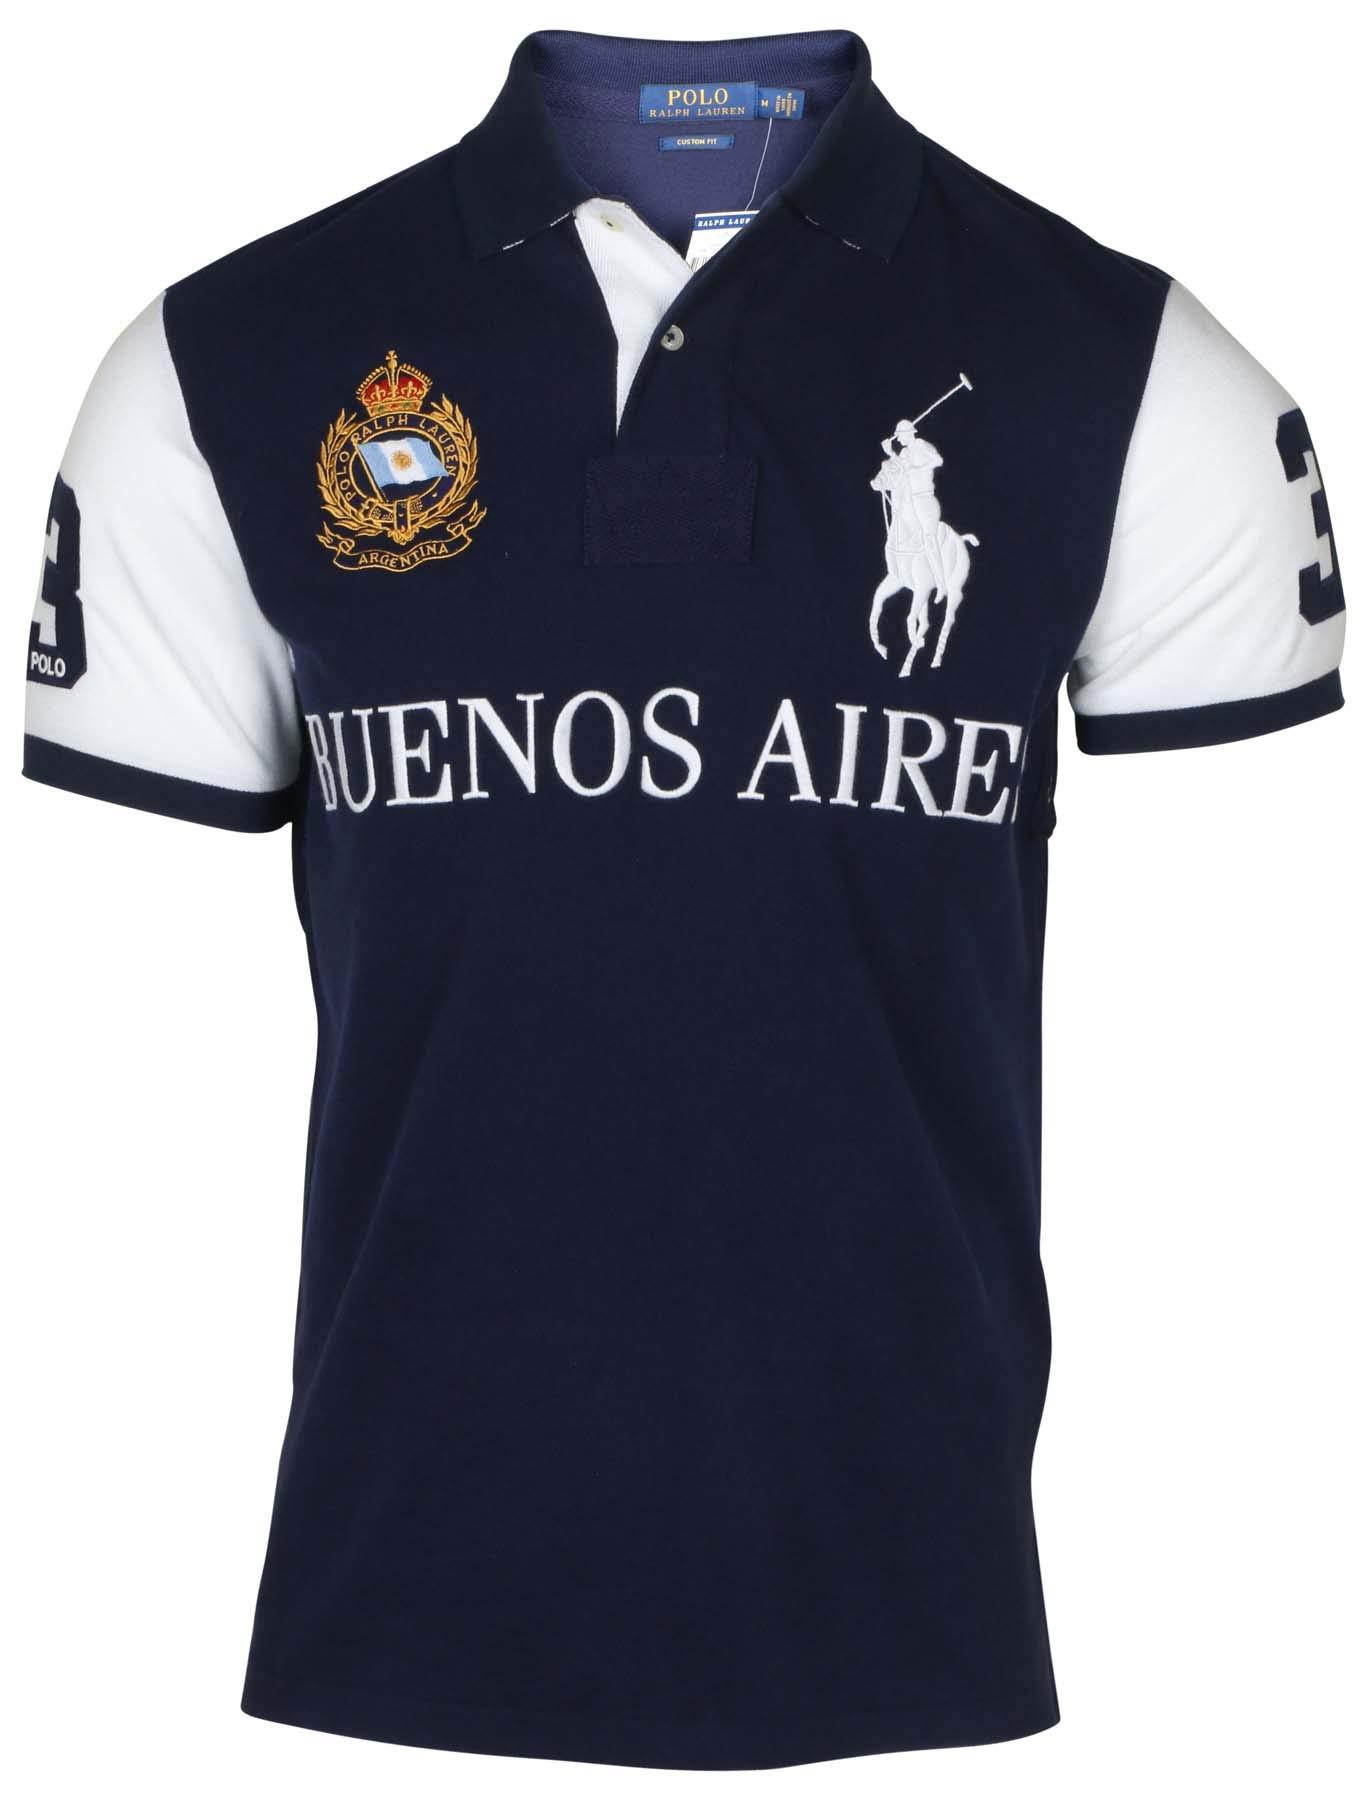 a6c64d07 Galleon - Polo Ralph Lauren Mens Big Pony City Custom Fit Mesh Polo Shirt  (S, White Miami)